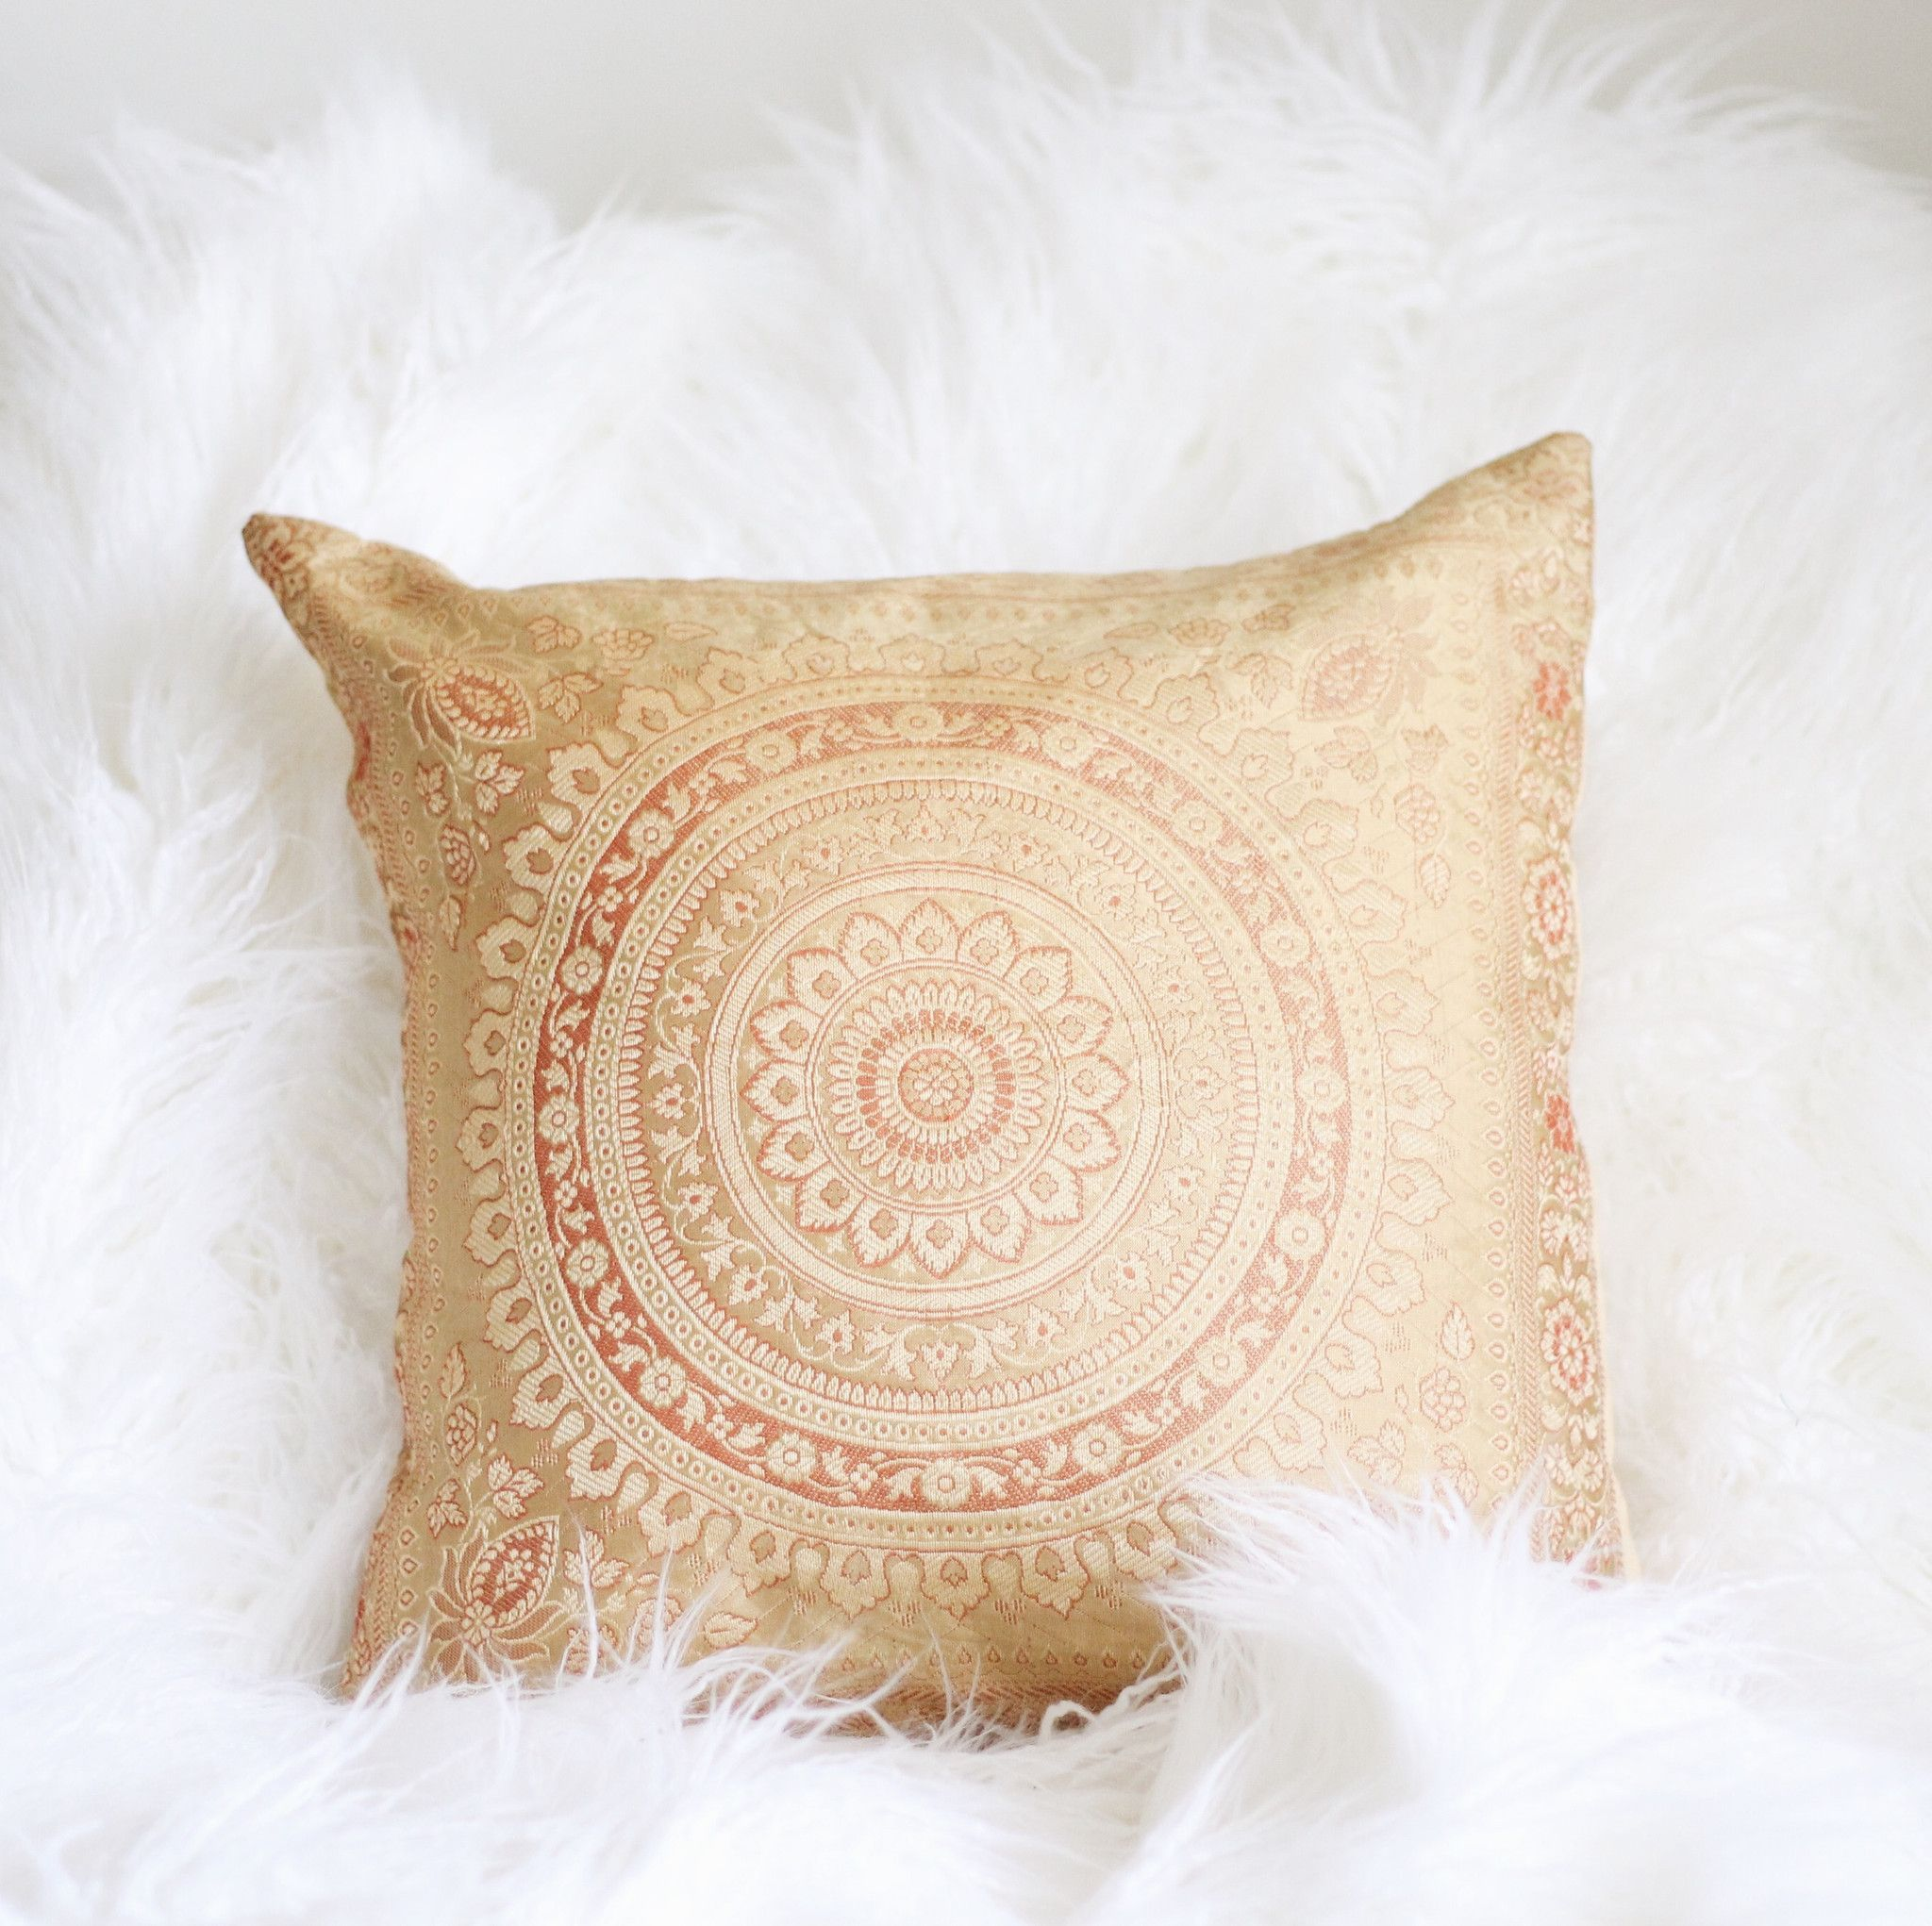 Brocade Home Decor Decoration hypnotic silk brocade pillow cover | silk brocade, pillows and